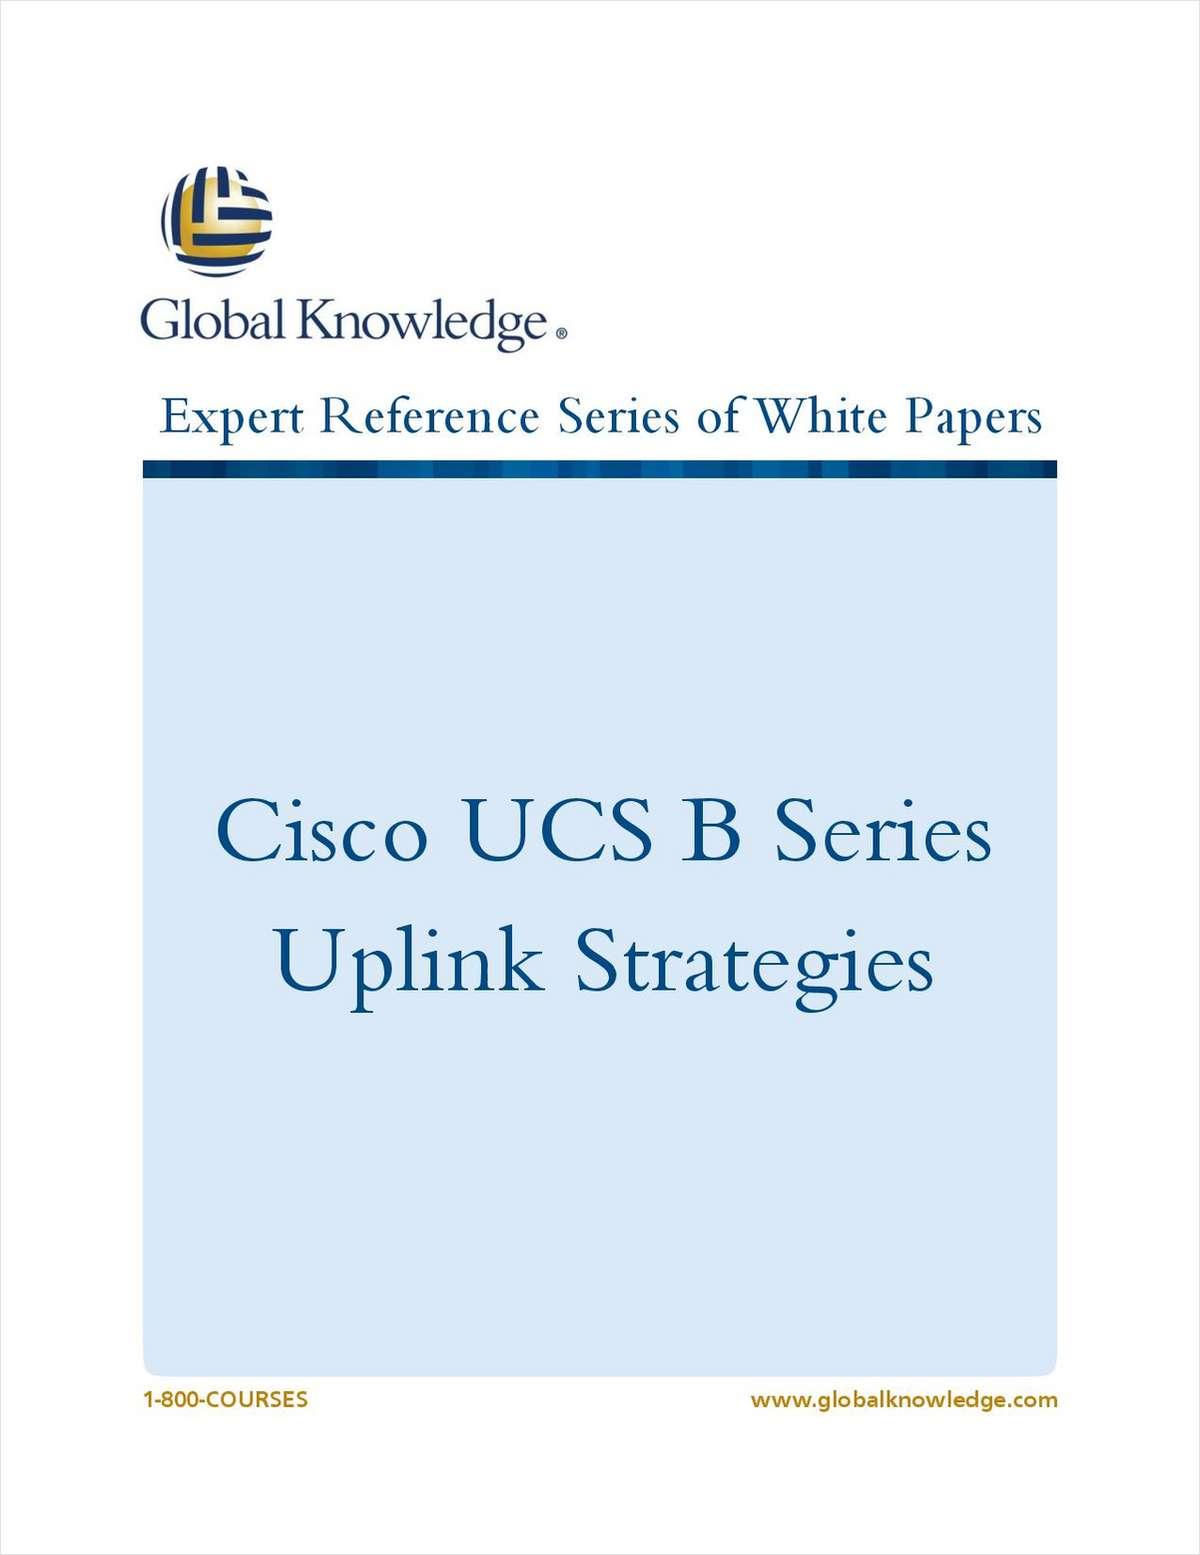 Cisco UCS B Series Uplink Strategies